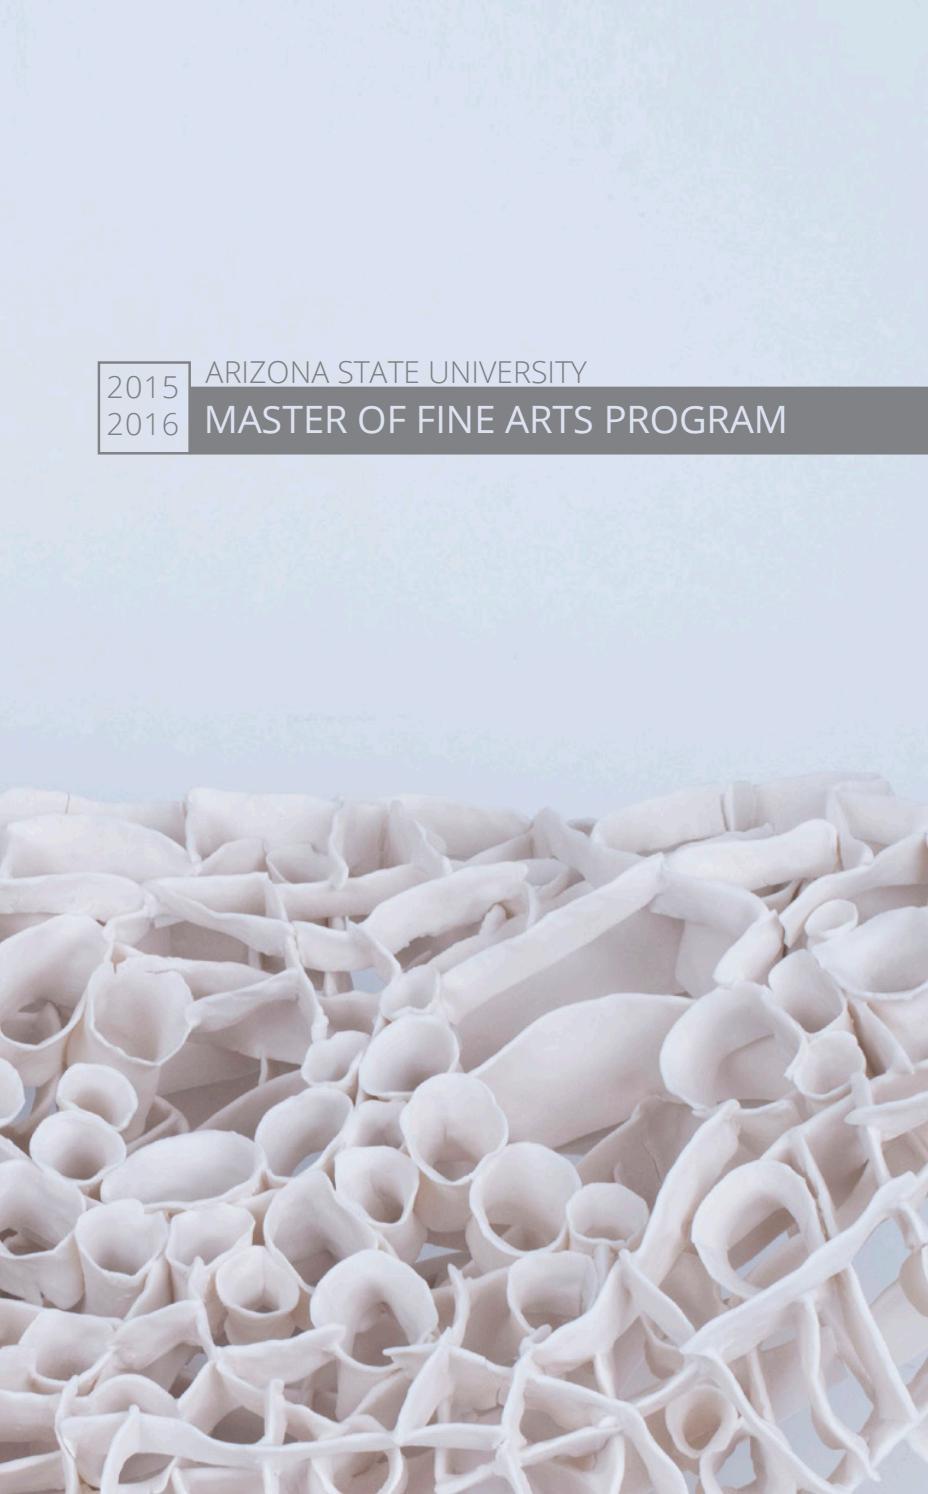 Marvelous Asu Master Of Fine Arts Program By Arizona State University Download Free Architecture Designs Intelgarnamadebymaigaardcom